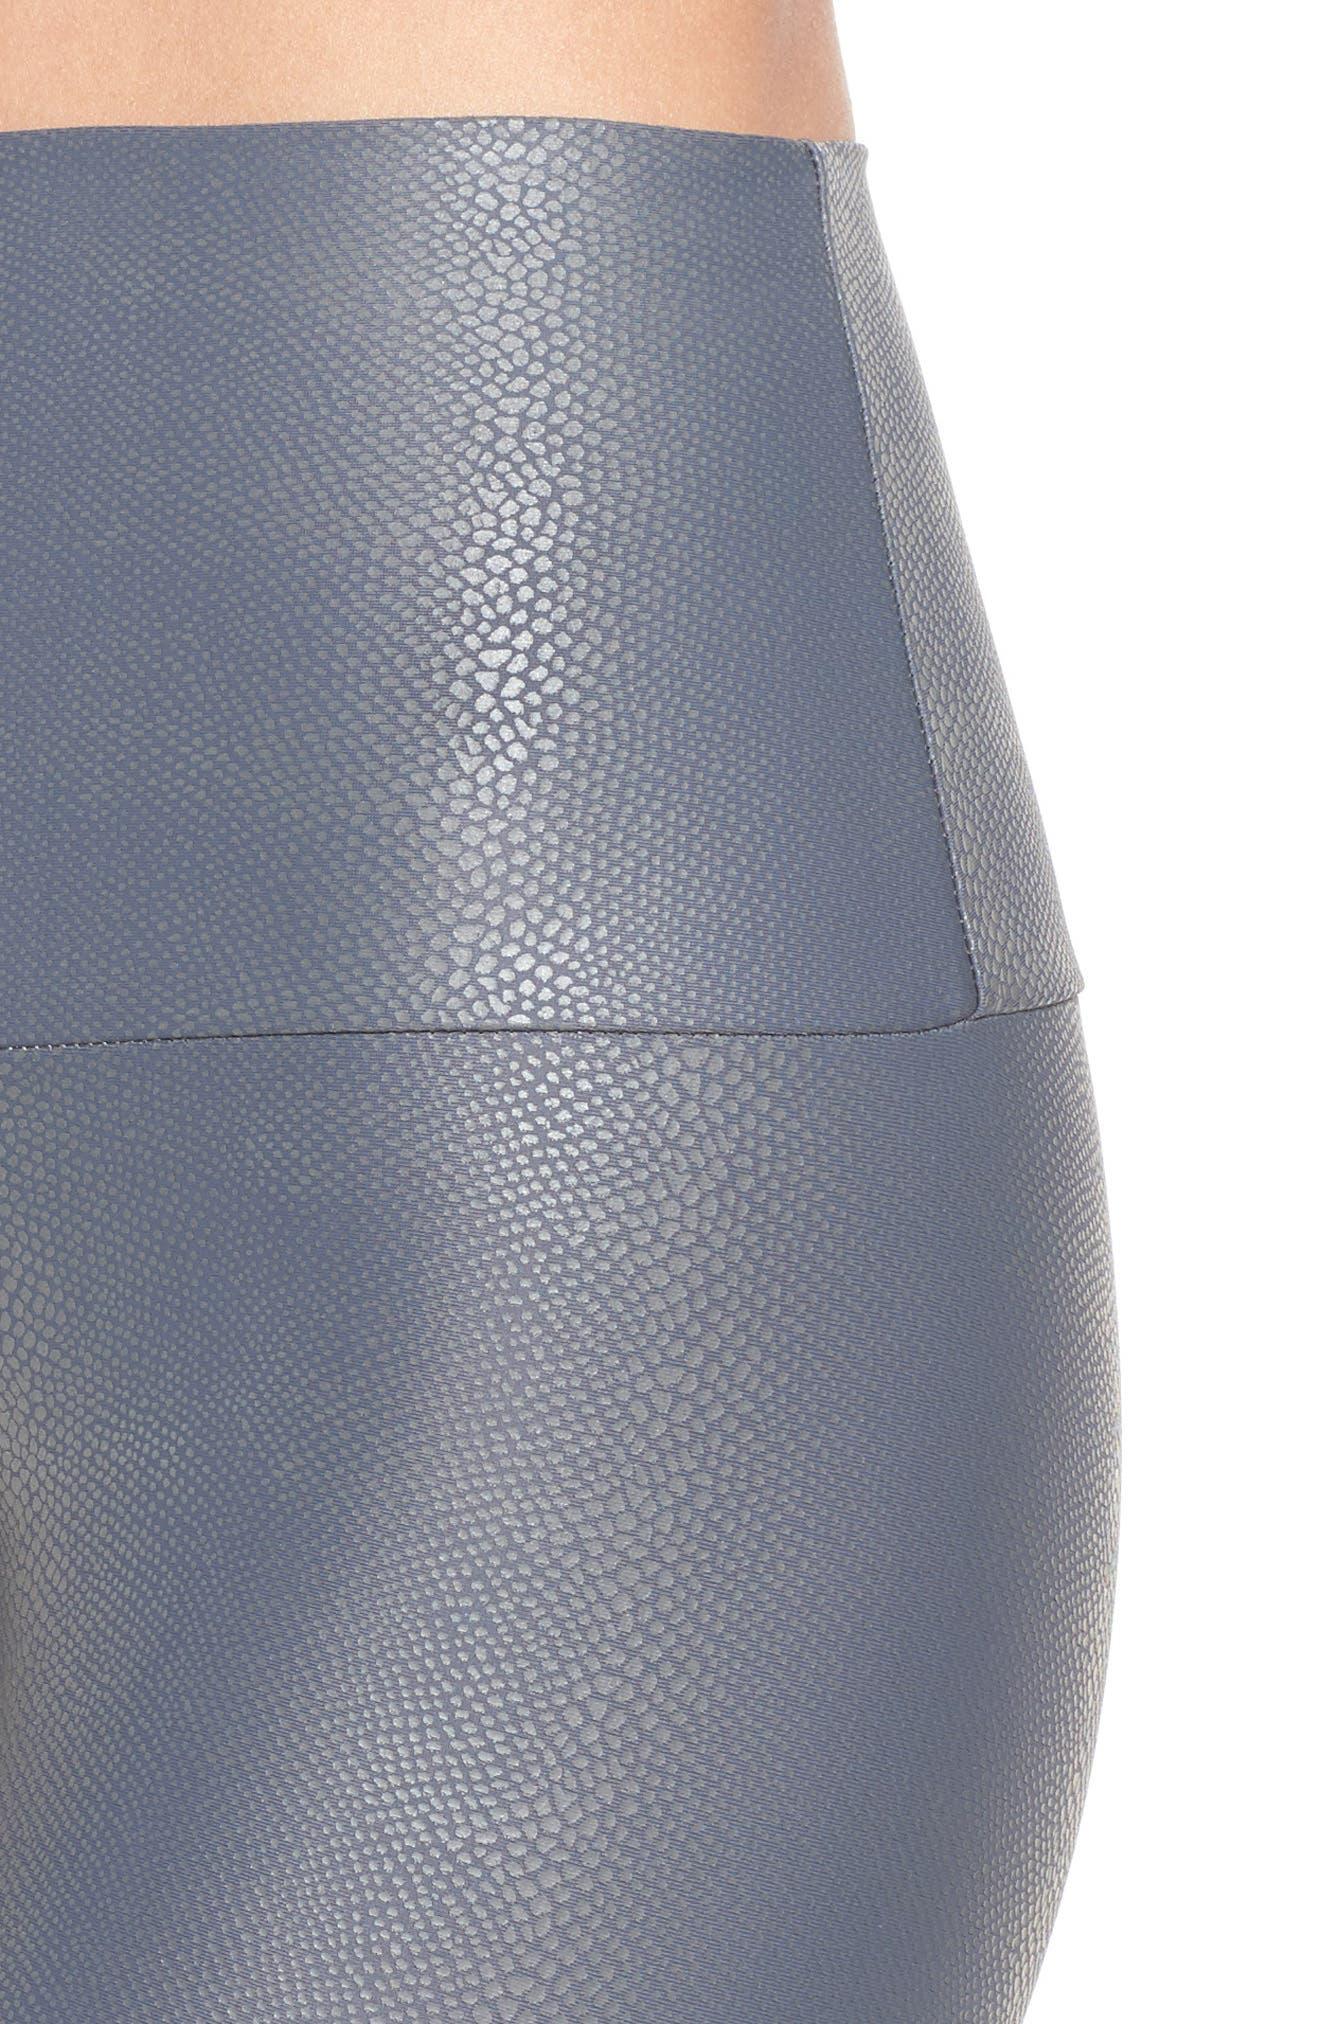 Alternate Image 4  - Onzie High Waist Leggings